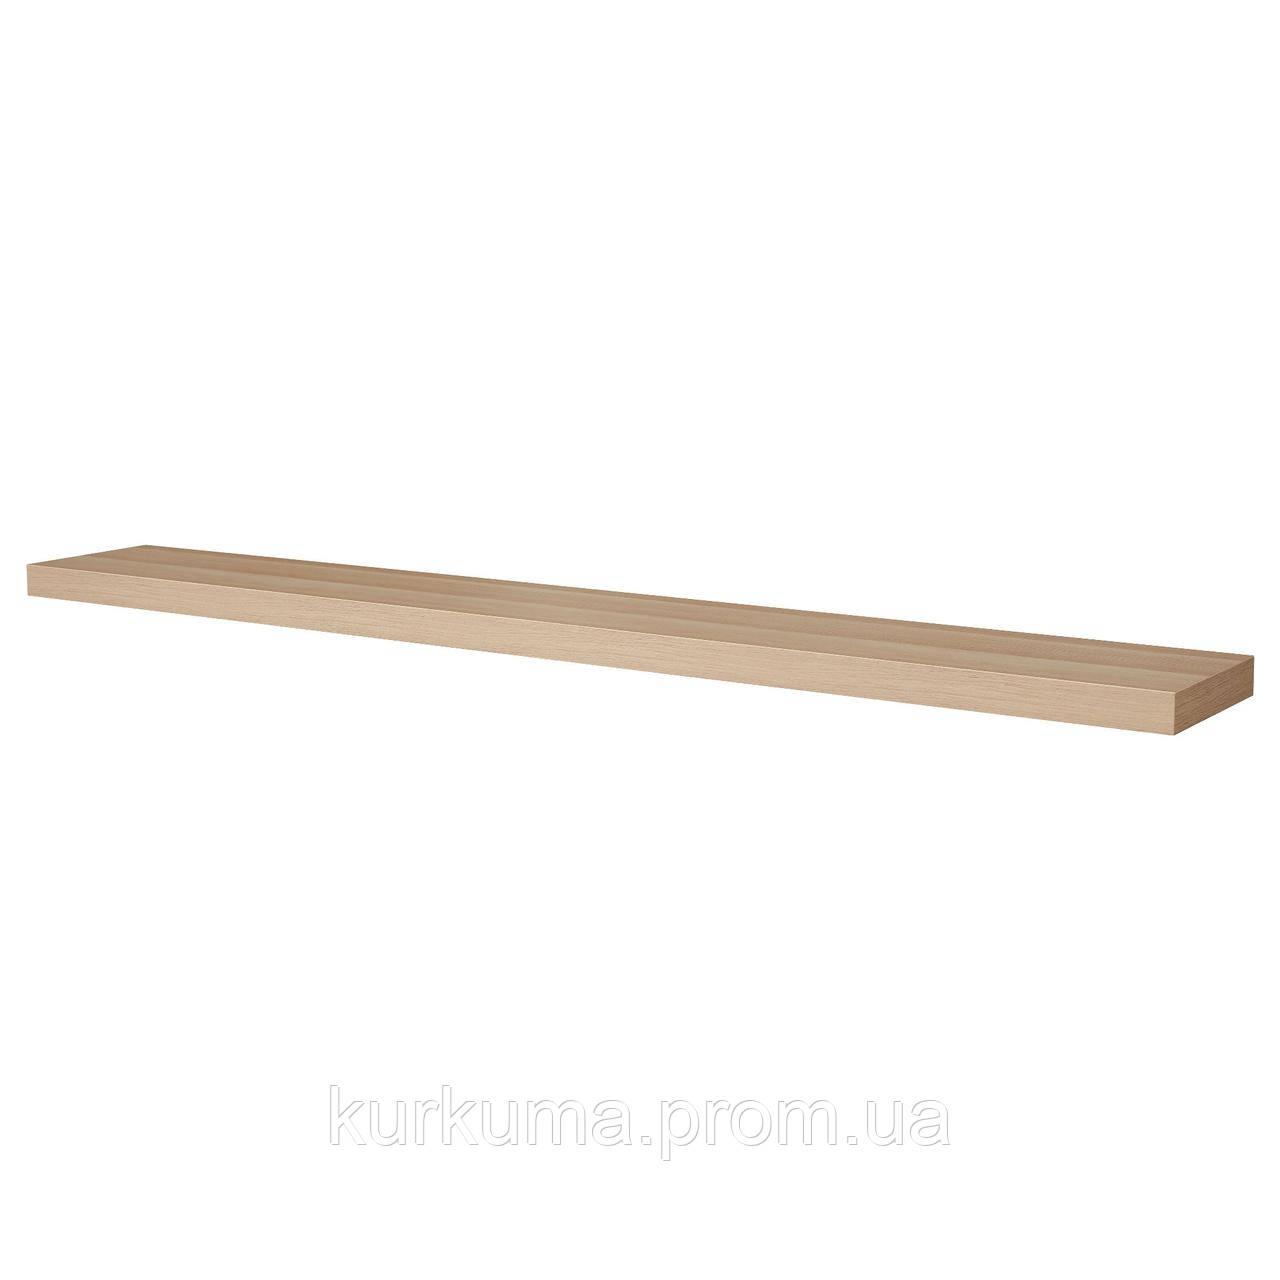 IKEA LACK Полка настенная, дуб белый стаинедед  (203.835.21)